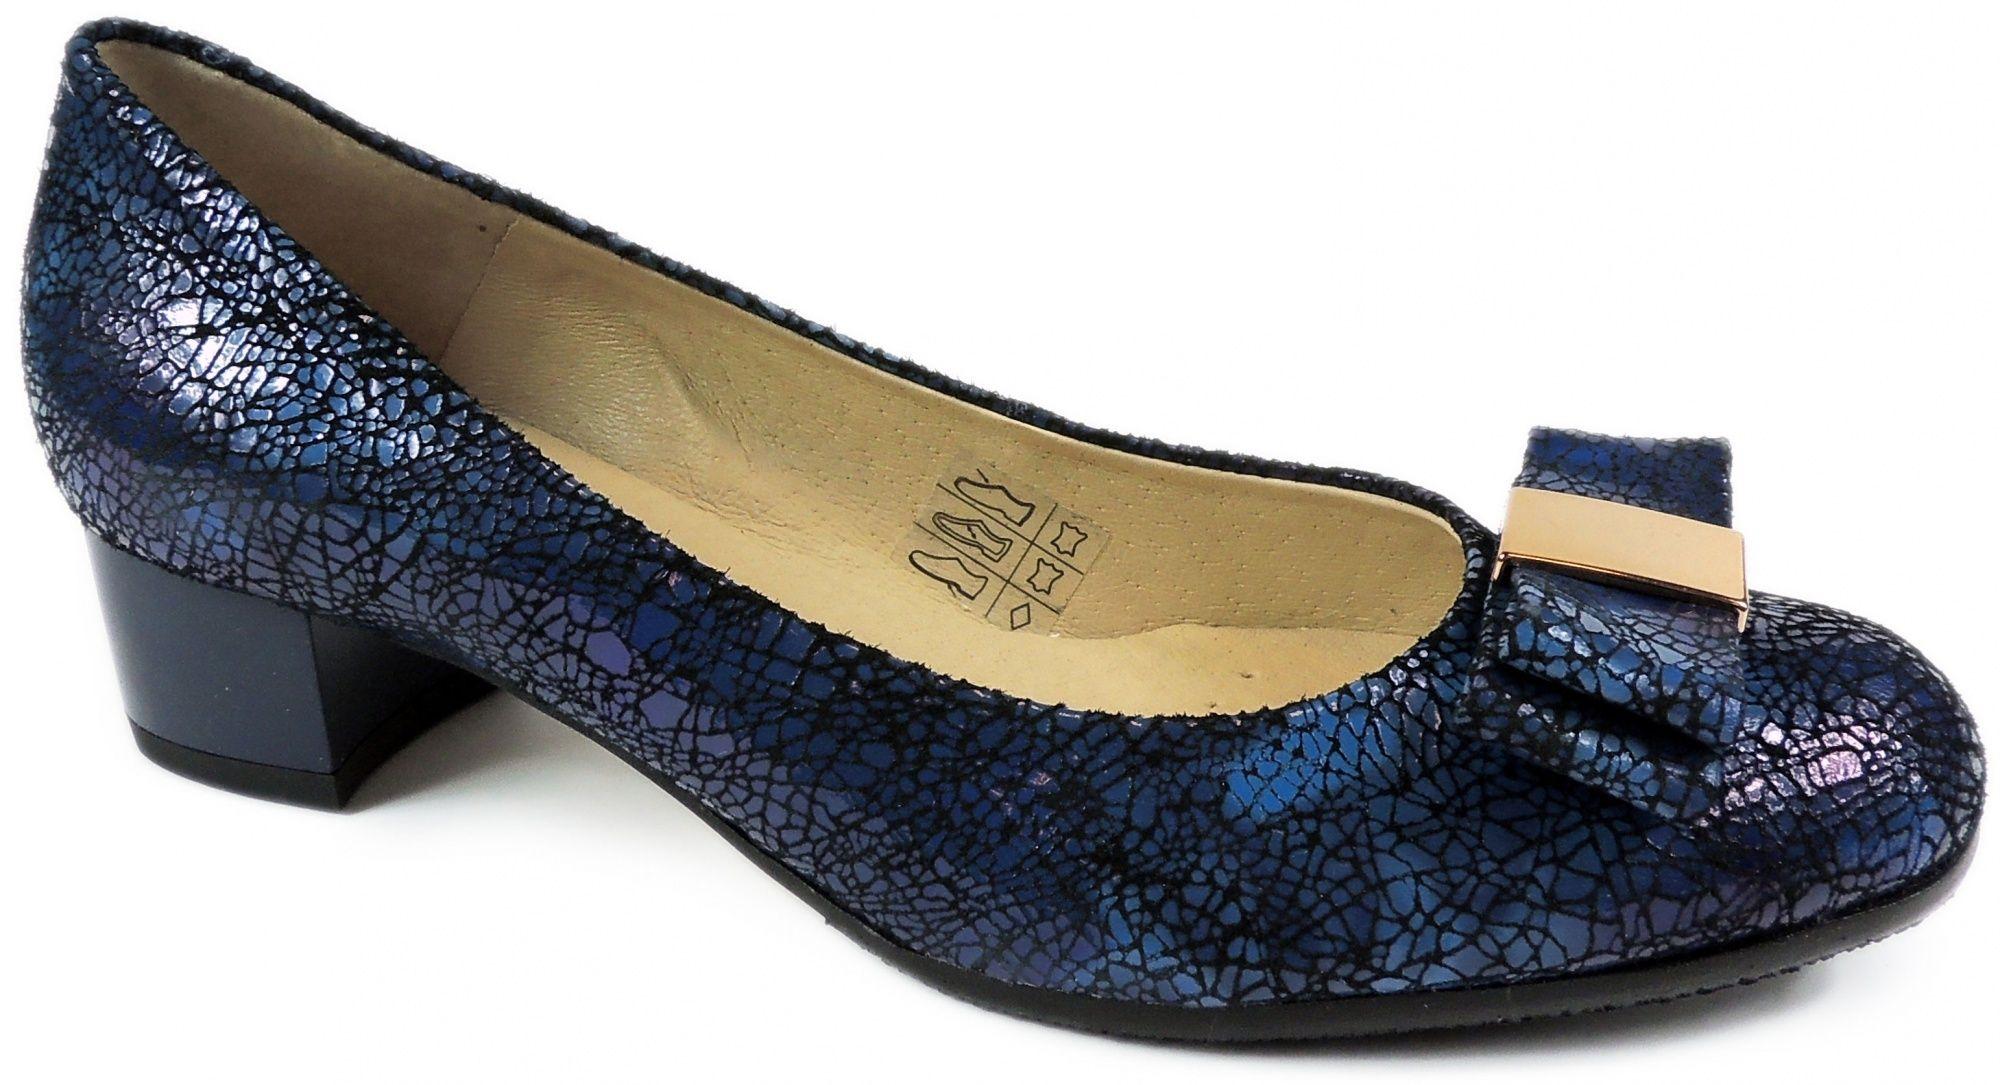 Stylowe Czolenka Markowe Intershoe Sklep Z Butami Online Intershoe Com Heels Shoes Peep Toe